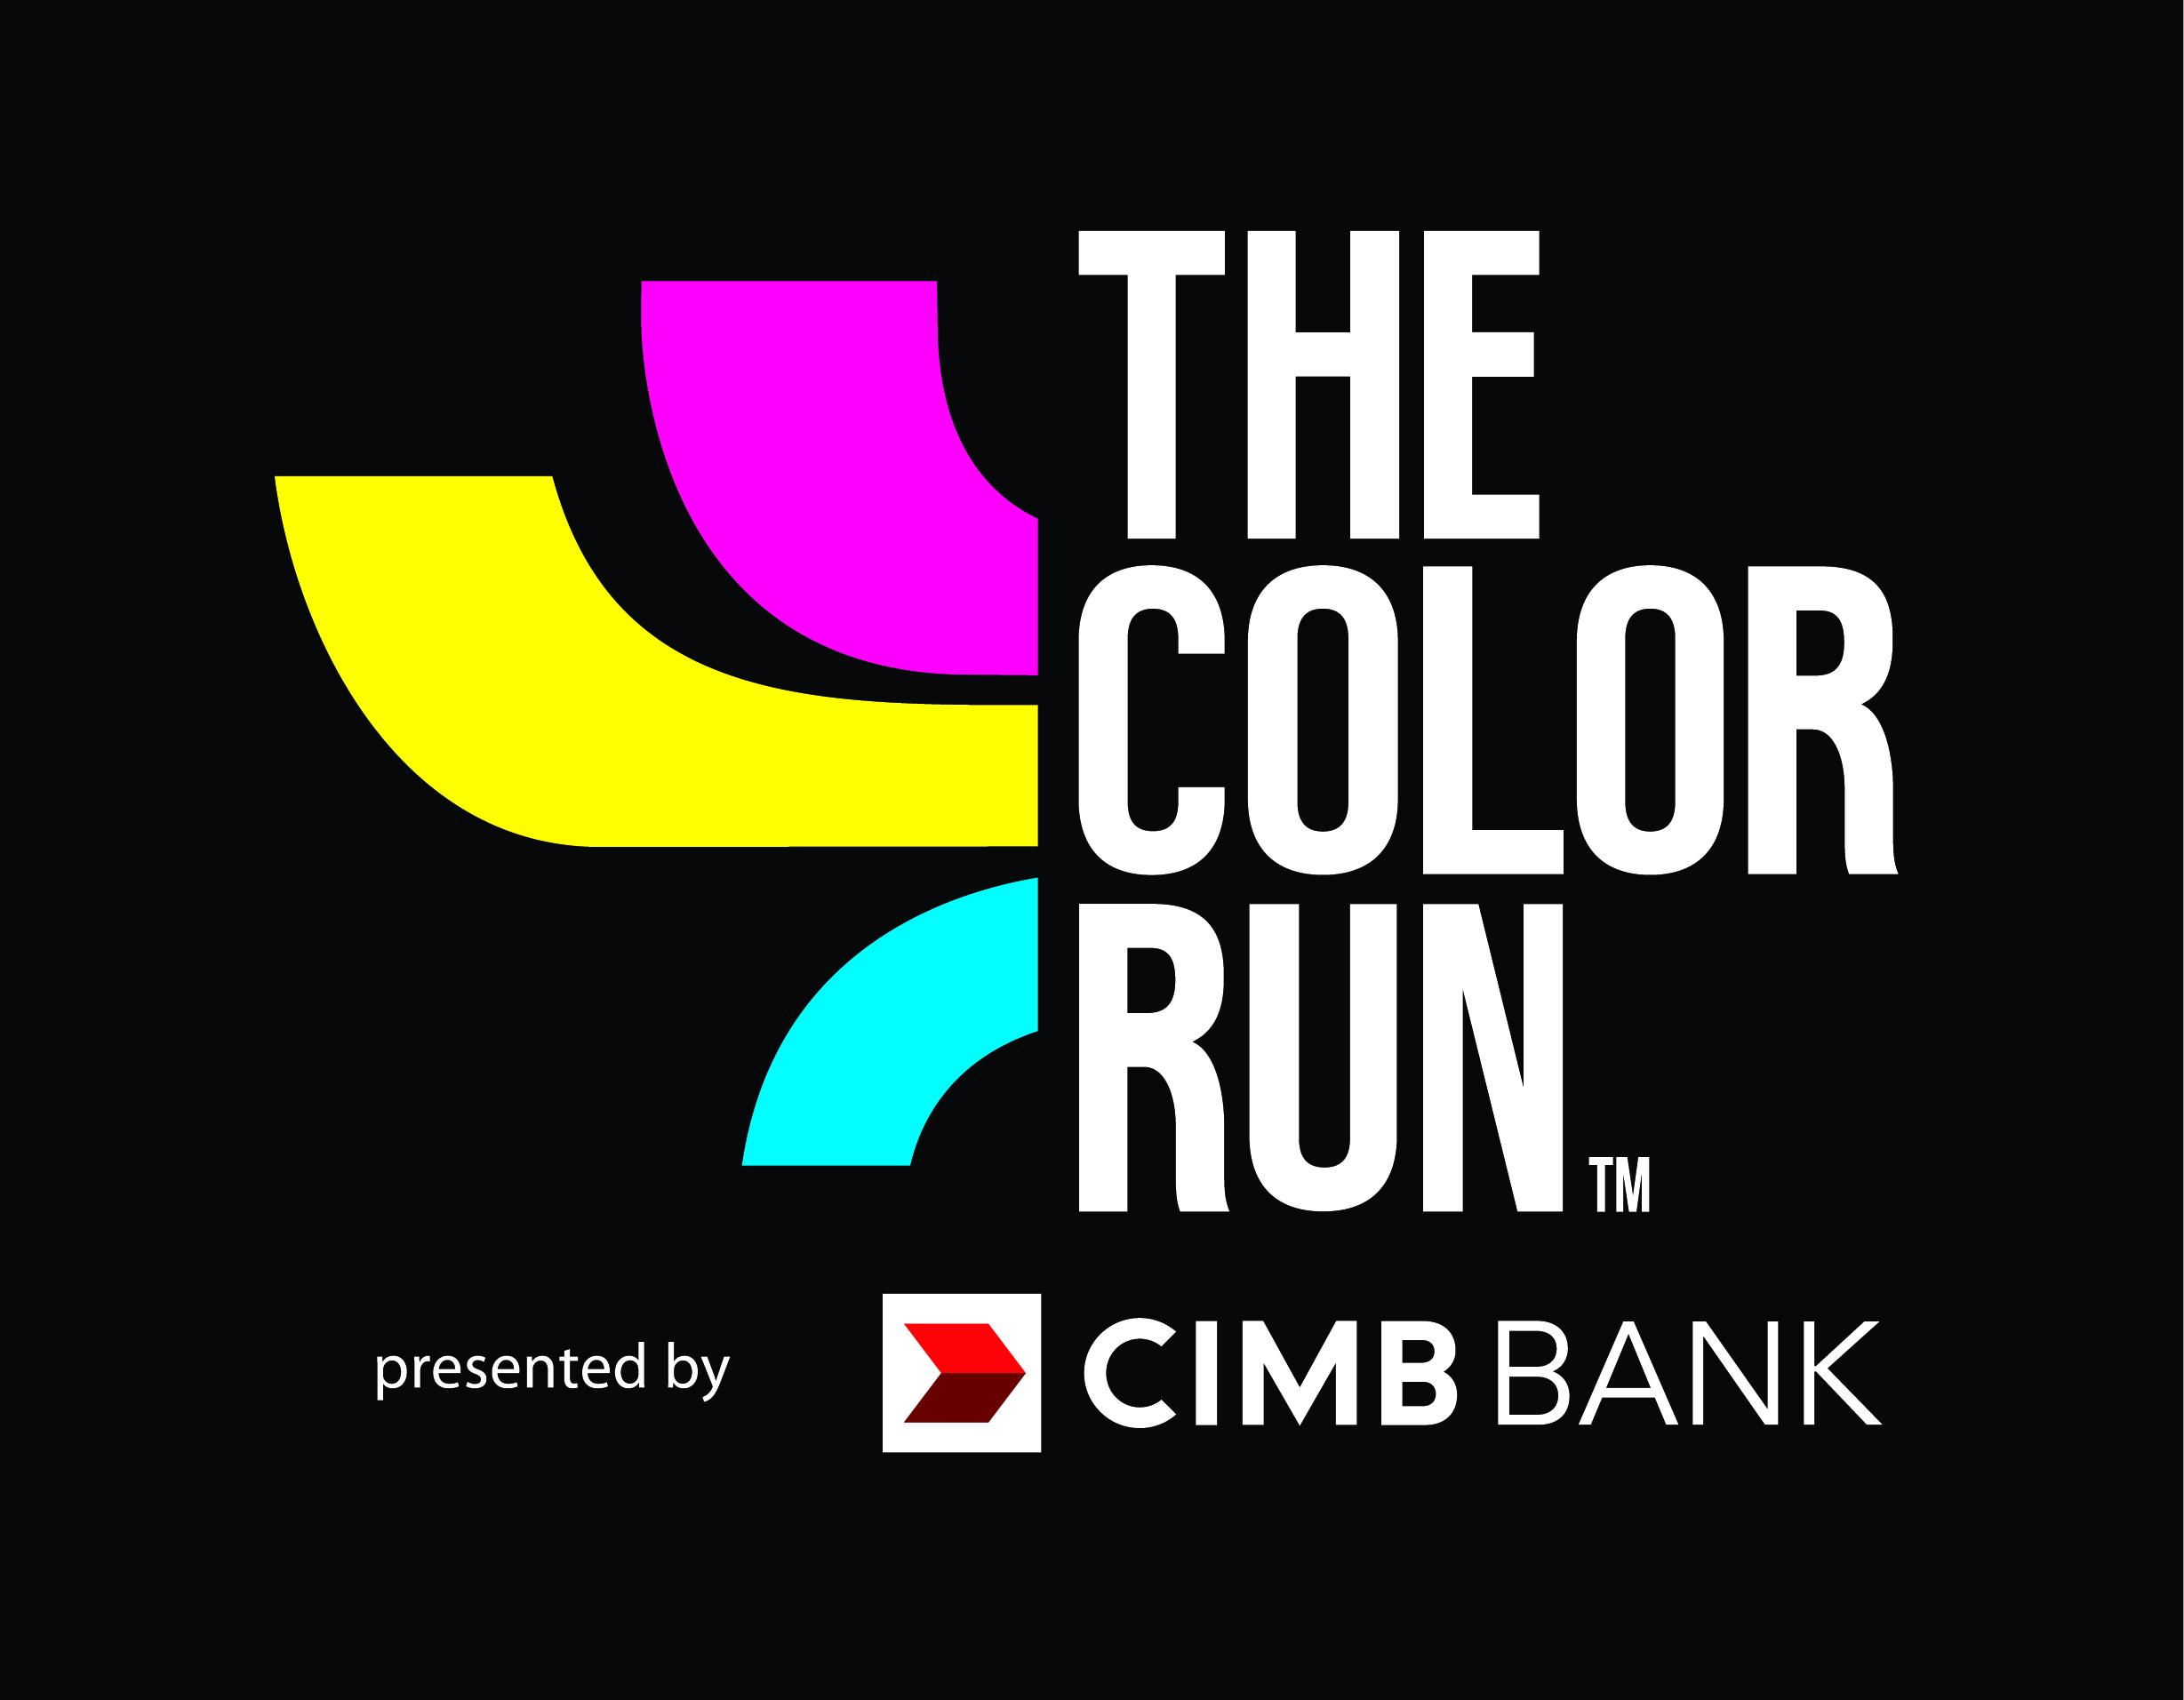 Bank of Singapore Logo About Cimb Bank Singapore